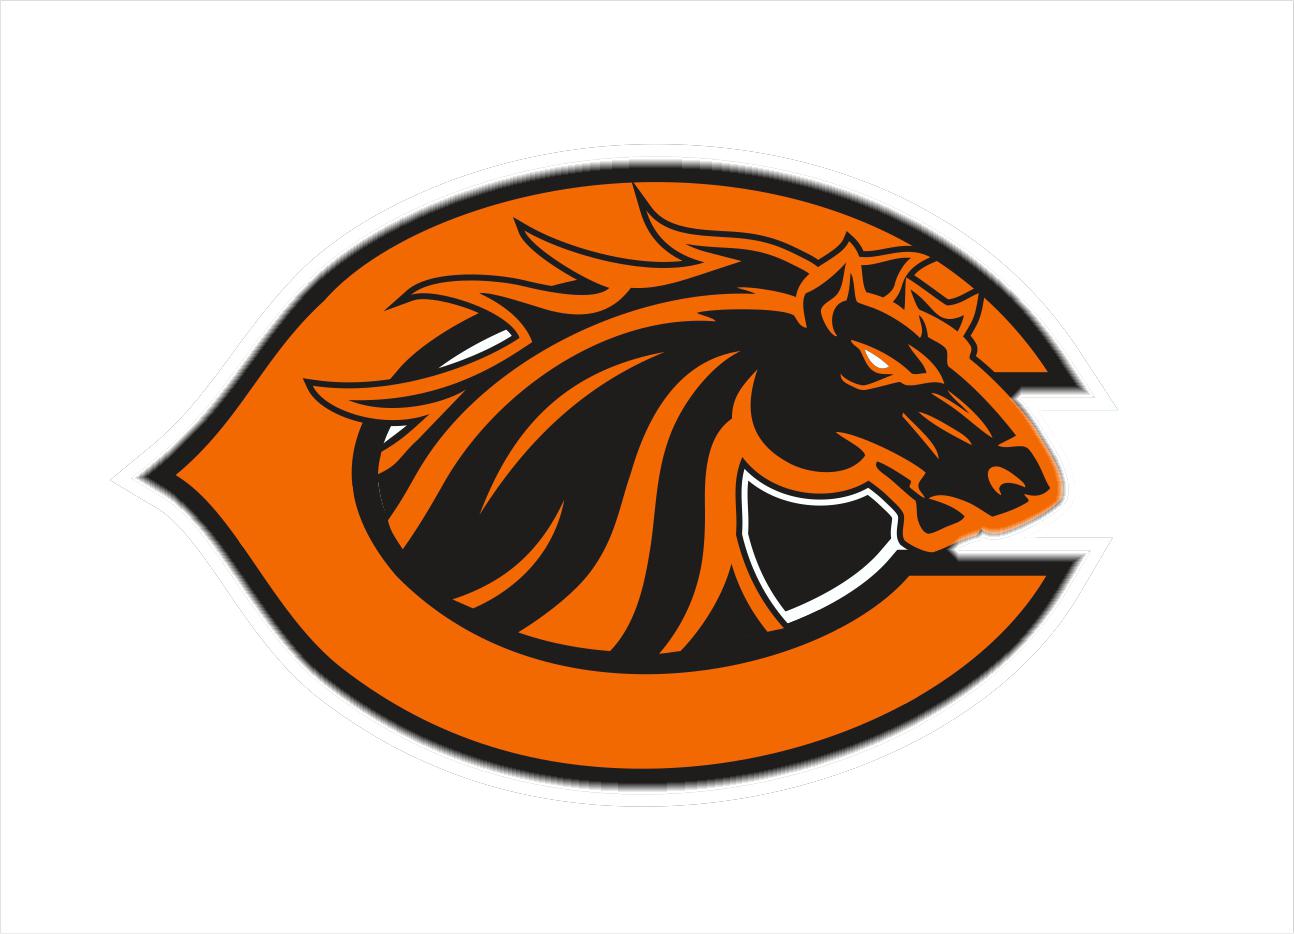 Clio Area Schools logo